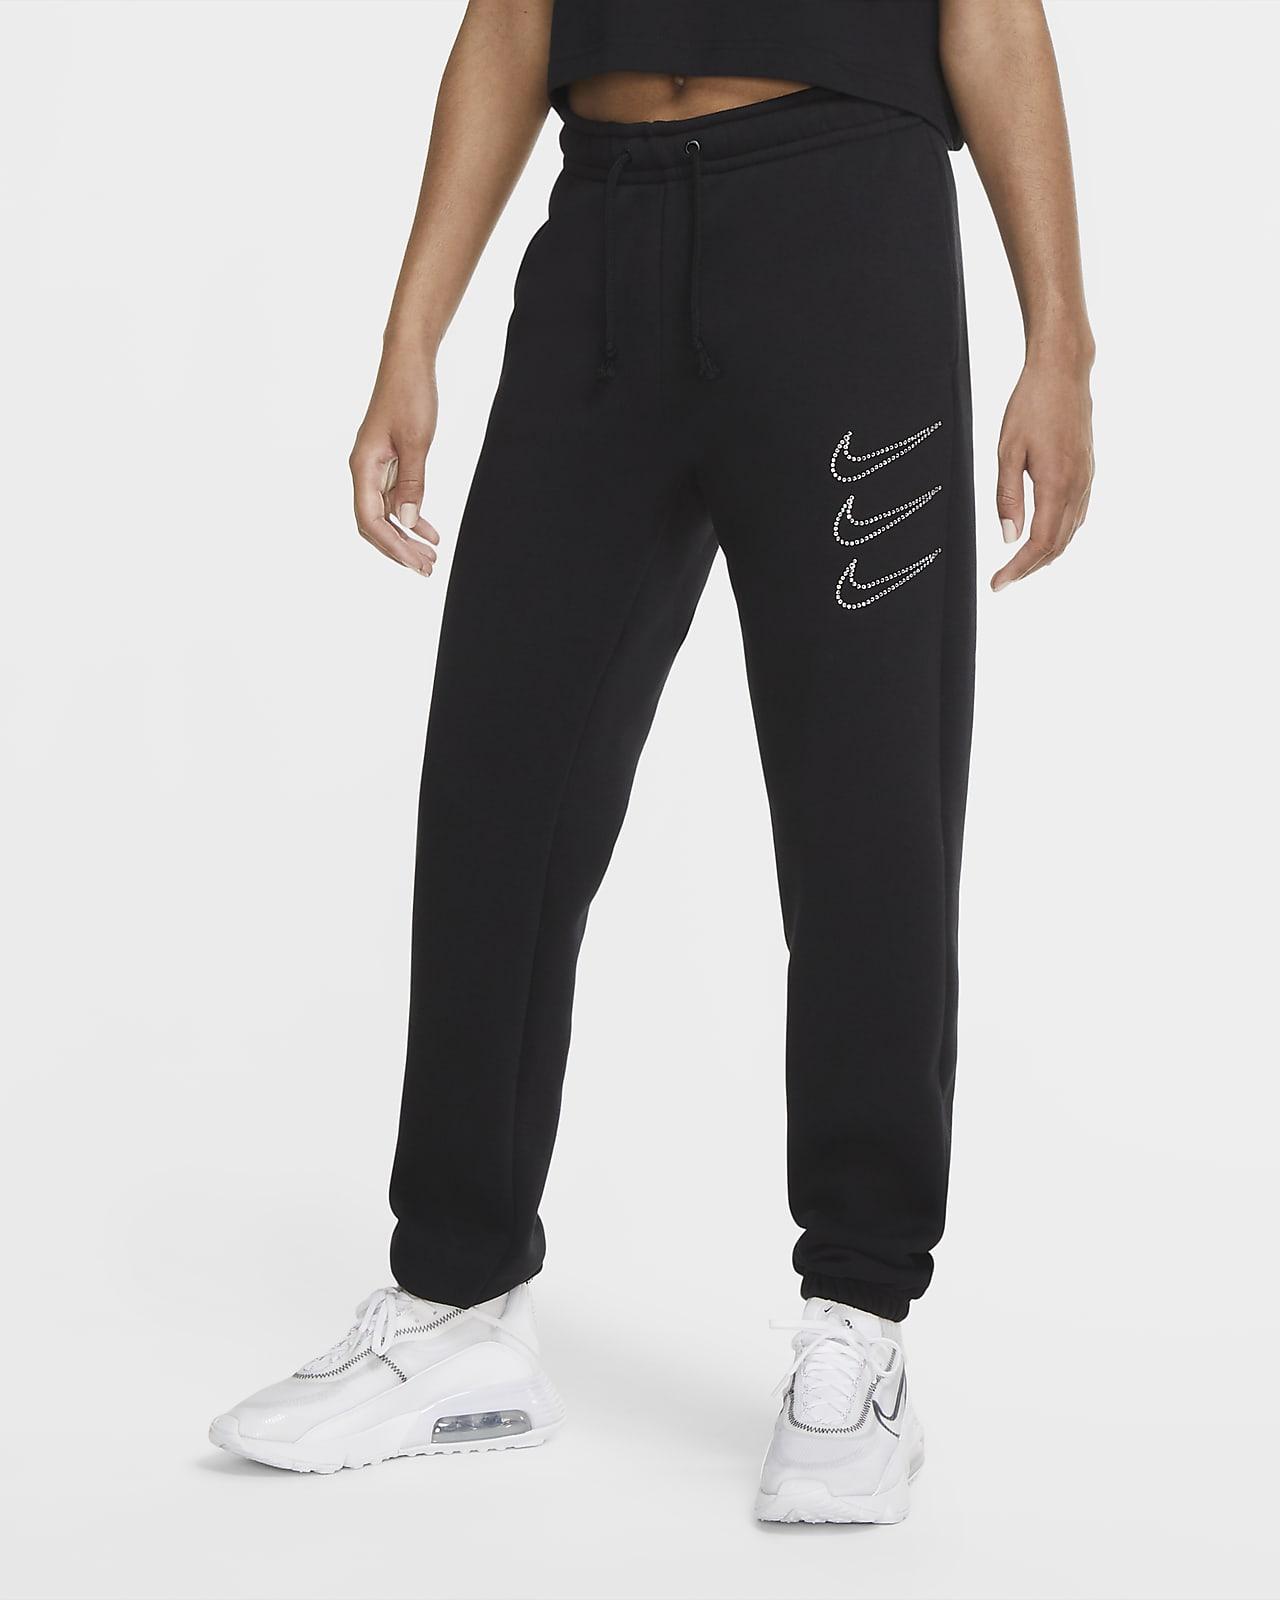 Nike Sportswear Rhinestone Fleecebroek voor dames